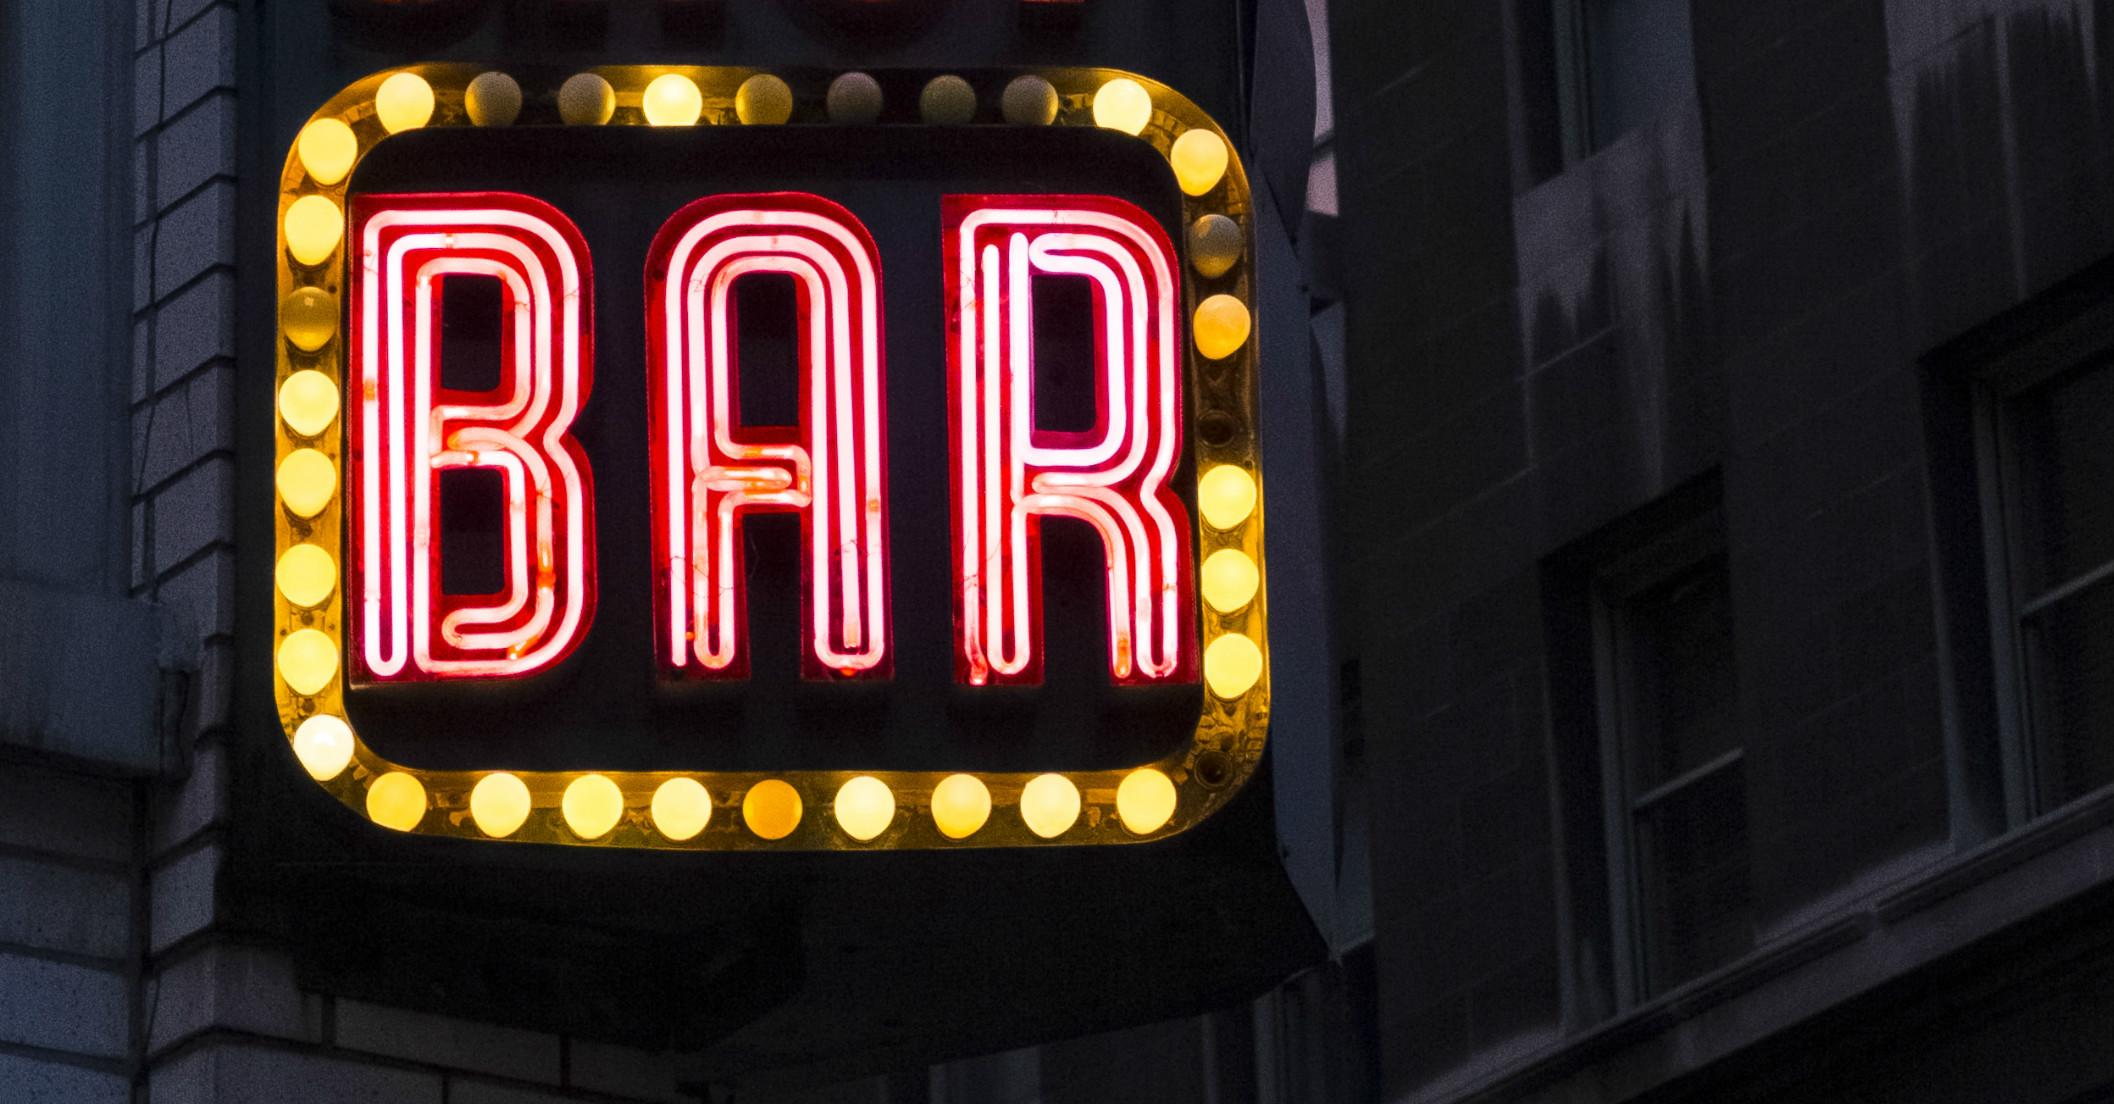 Nightlife In New York City This Week photo